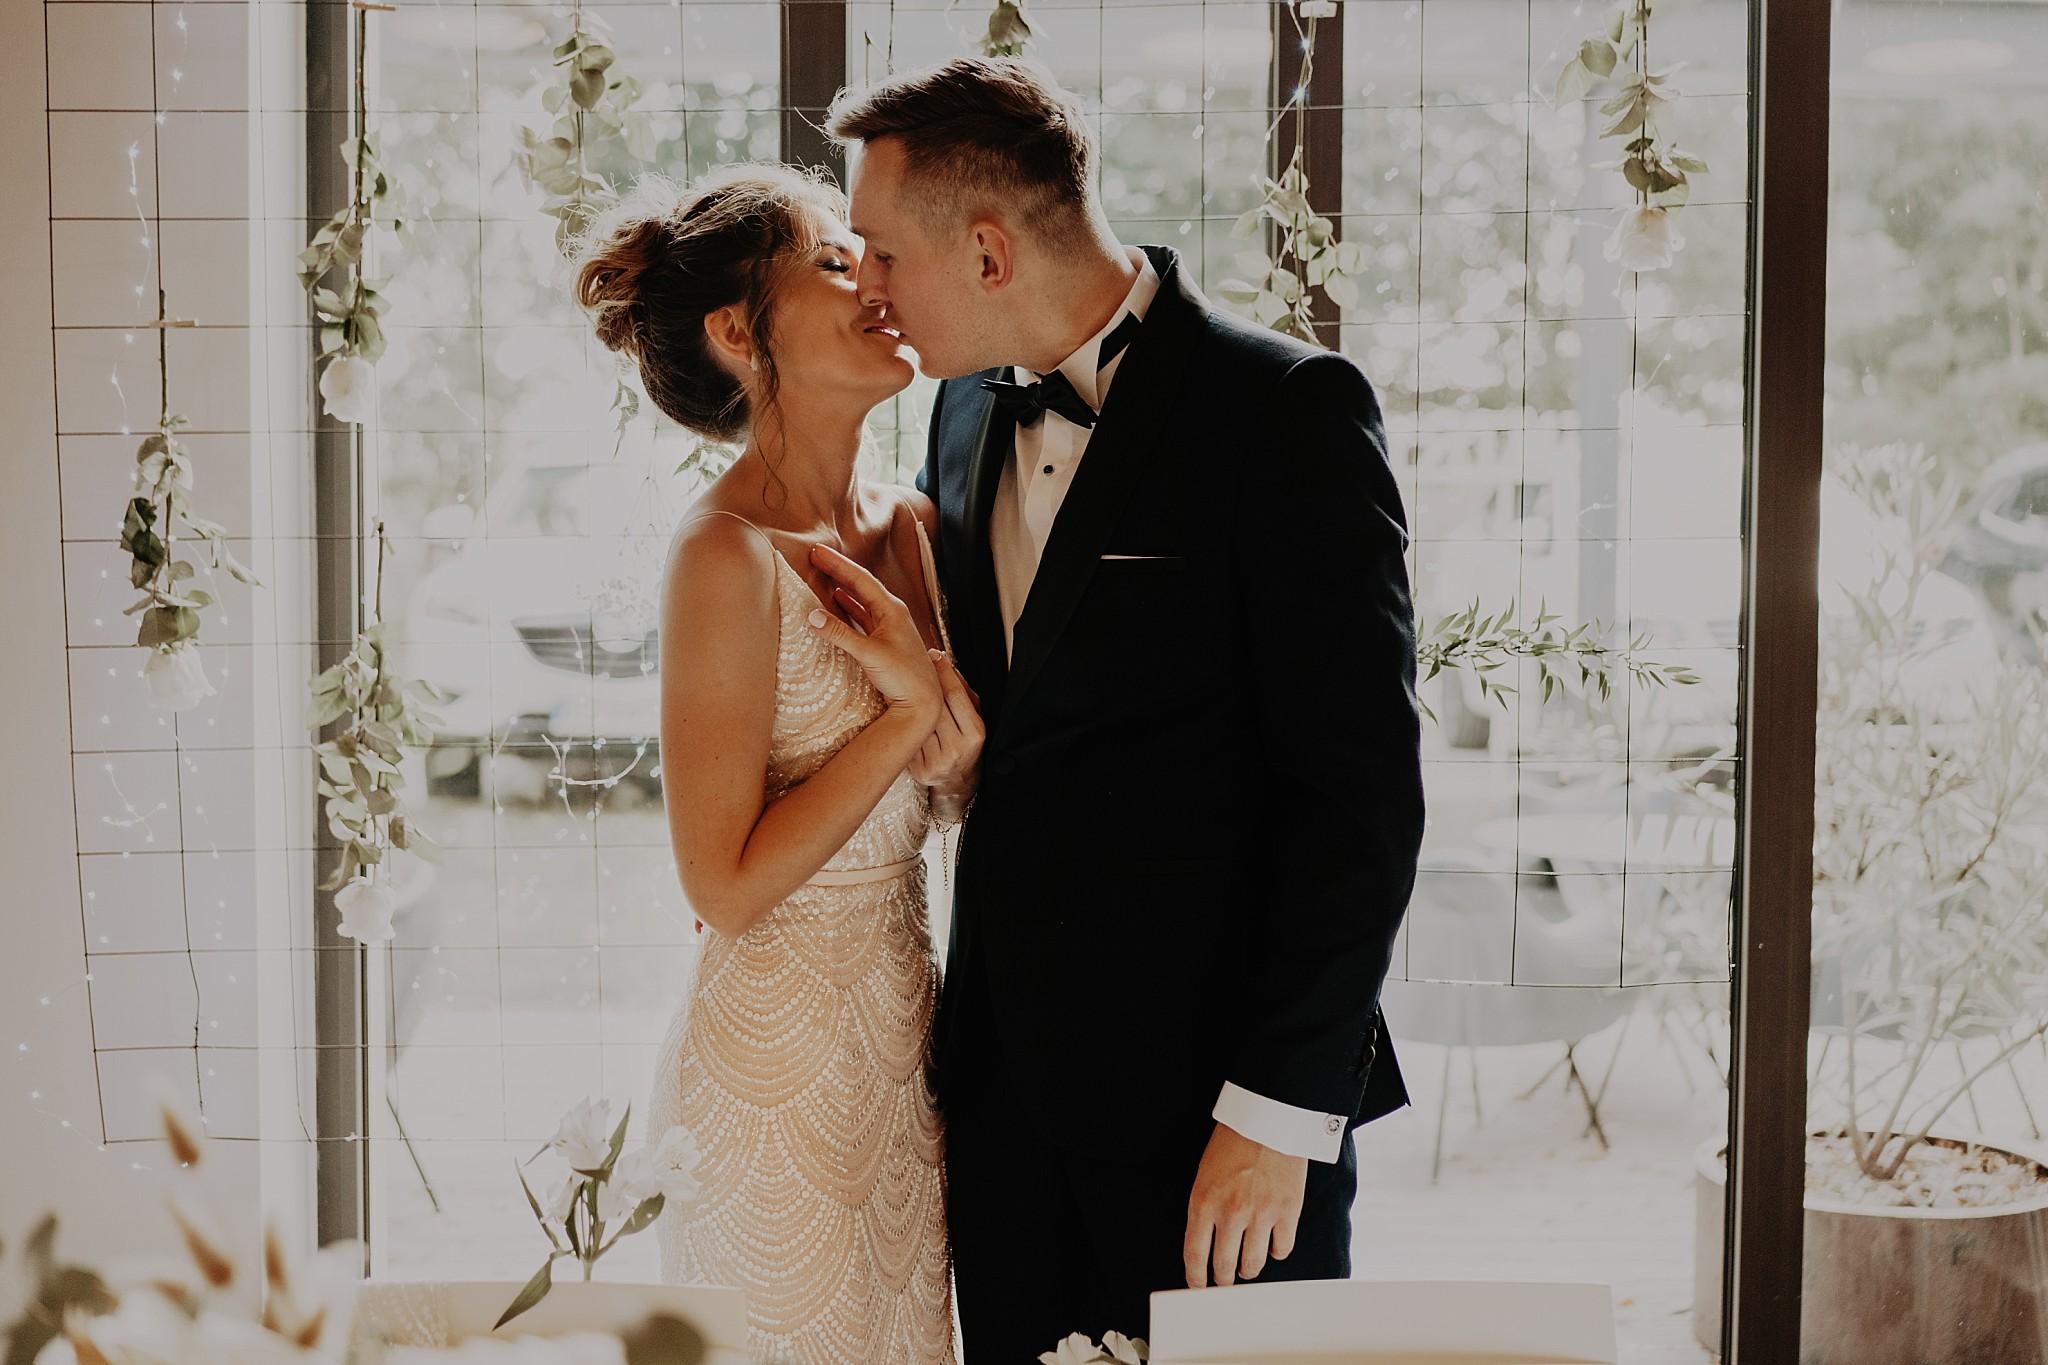 fotograf poznan wesele dobra truskawka piekne wesele pod poznaniem wesele w dobrej truskawce piekna para mloda slub marzen slub koronawirus slub listopad wesele koronawirus 301